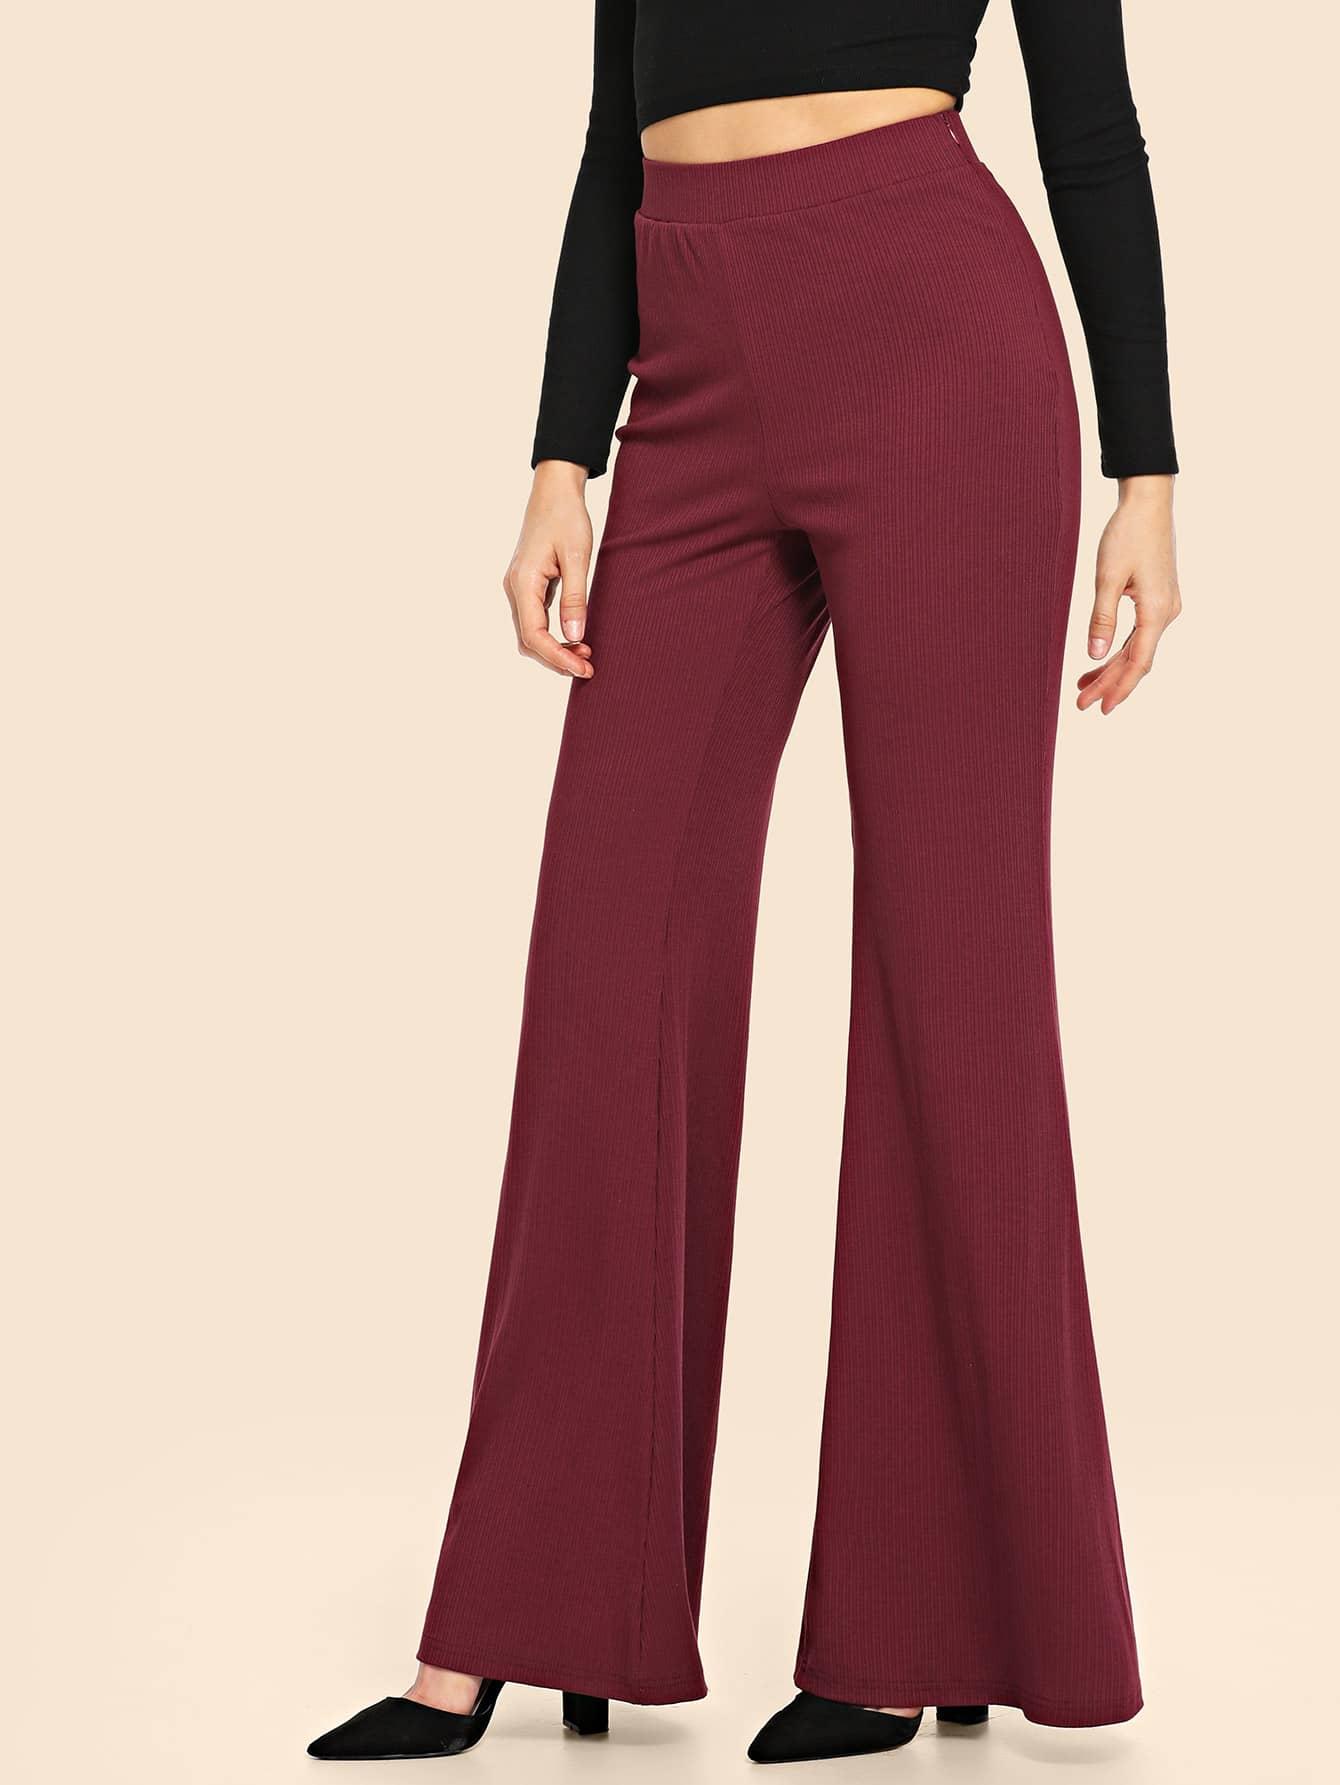 70s вязаные однотонные брюки клеш thumbnail